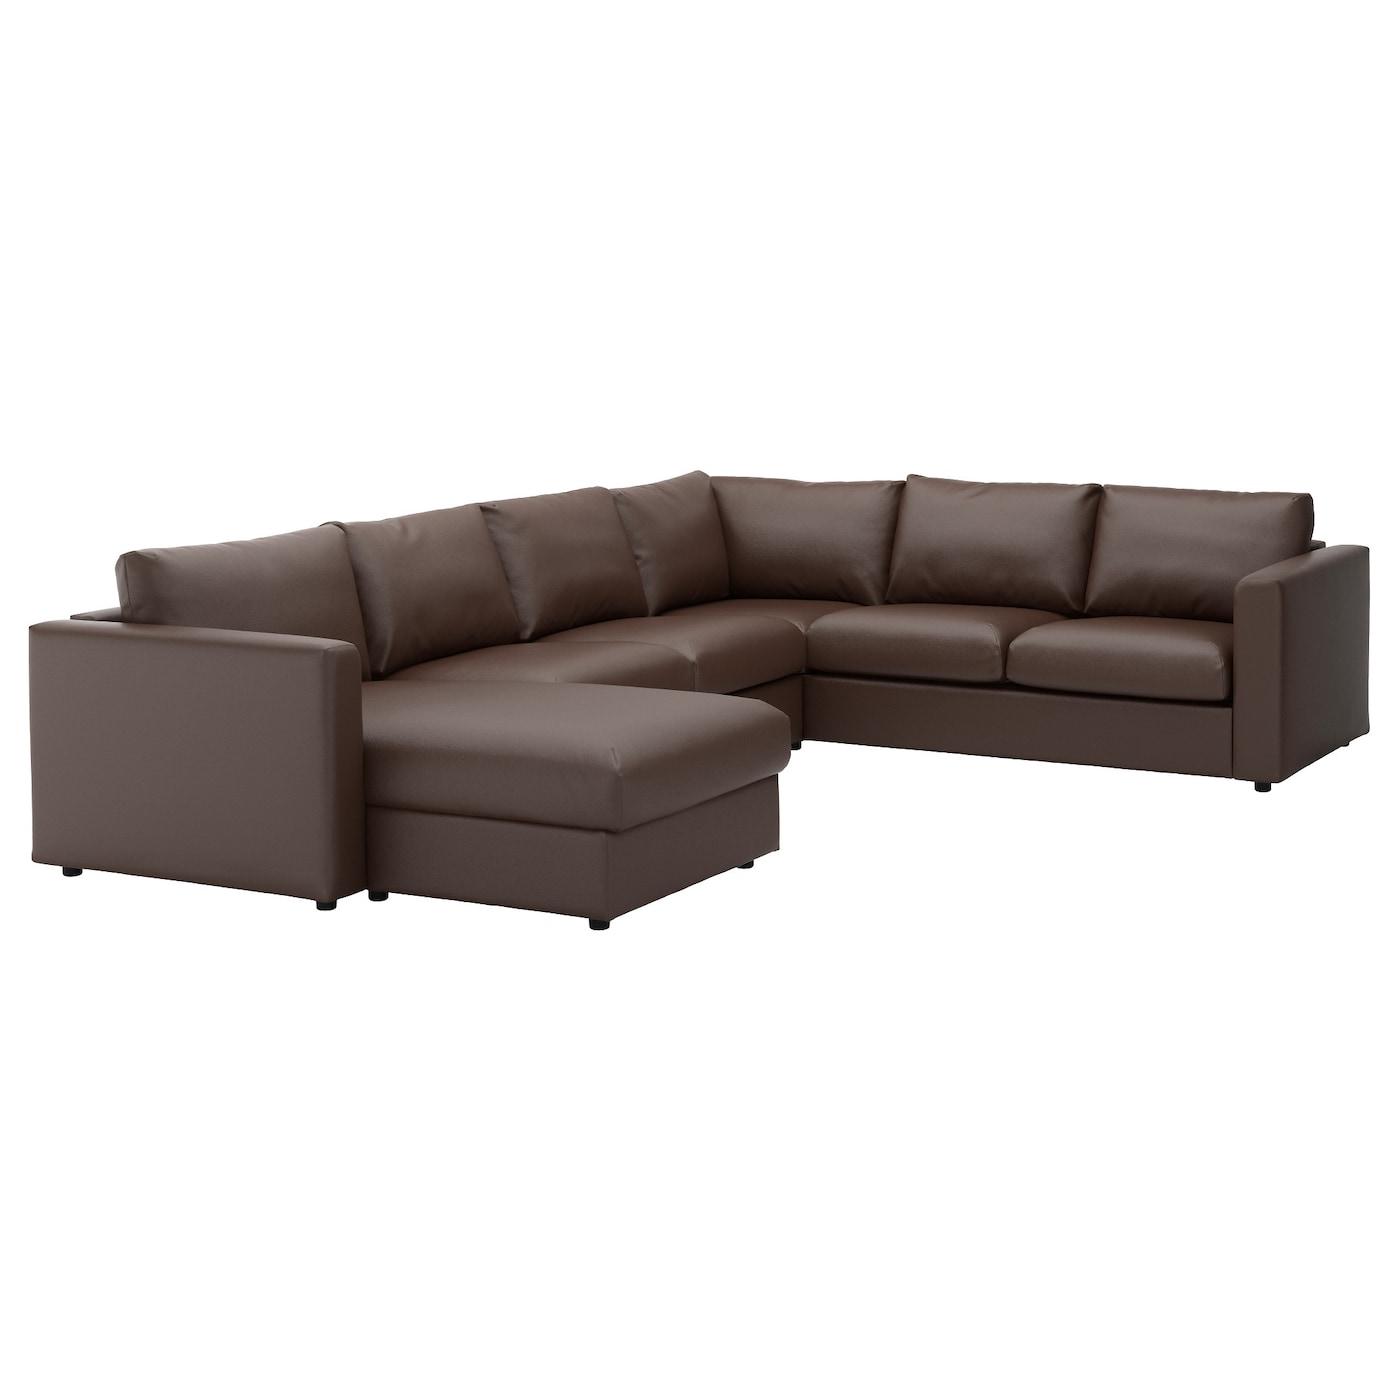 Vimle Sofa 5 Plazas Esquina Chaiselongue Farsta Marron Oscuro Ikea